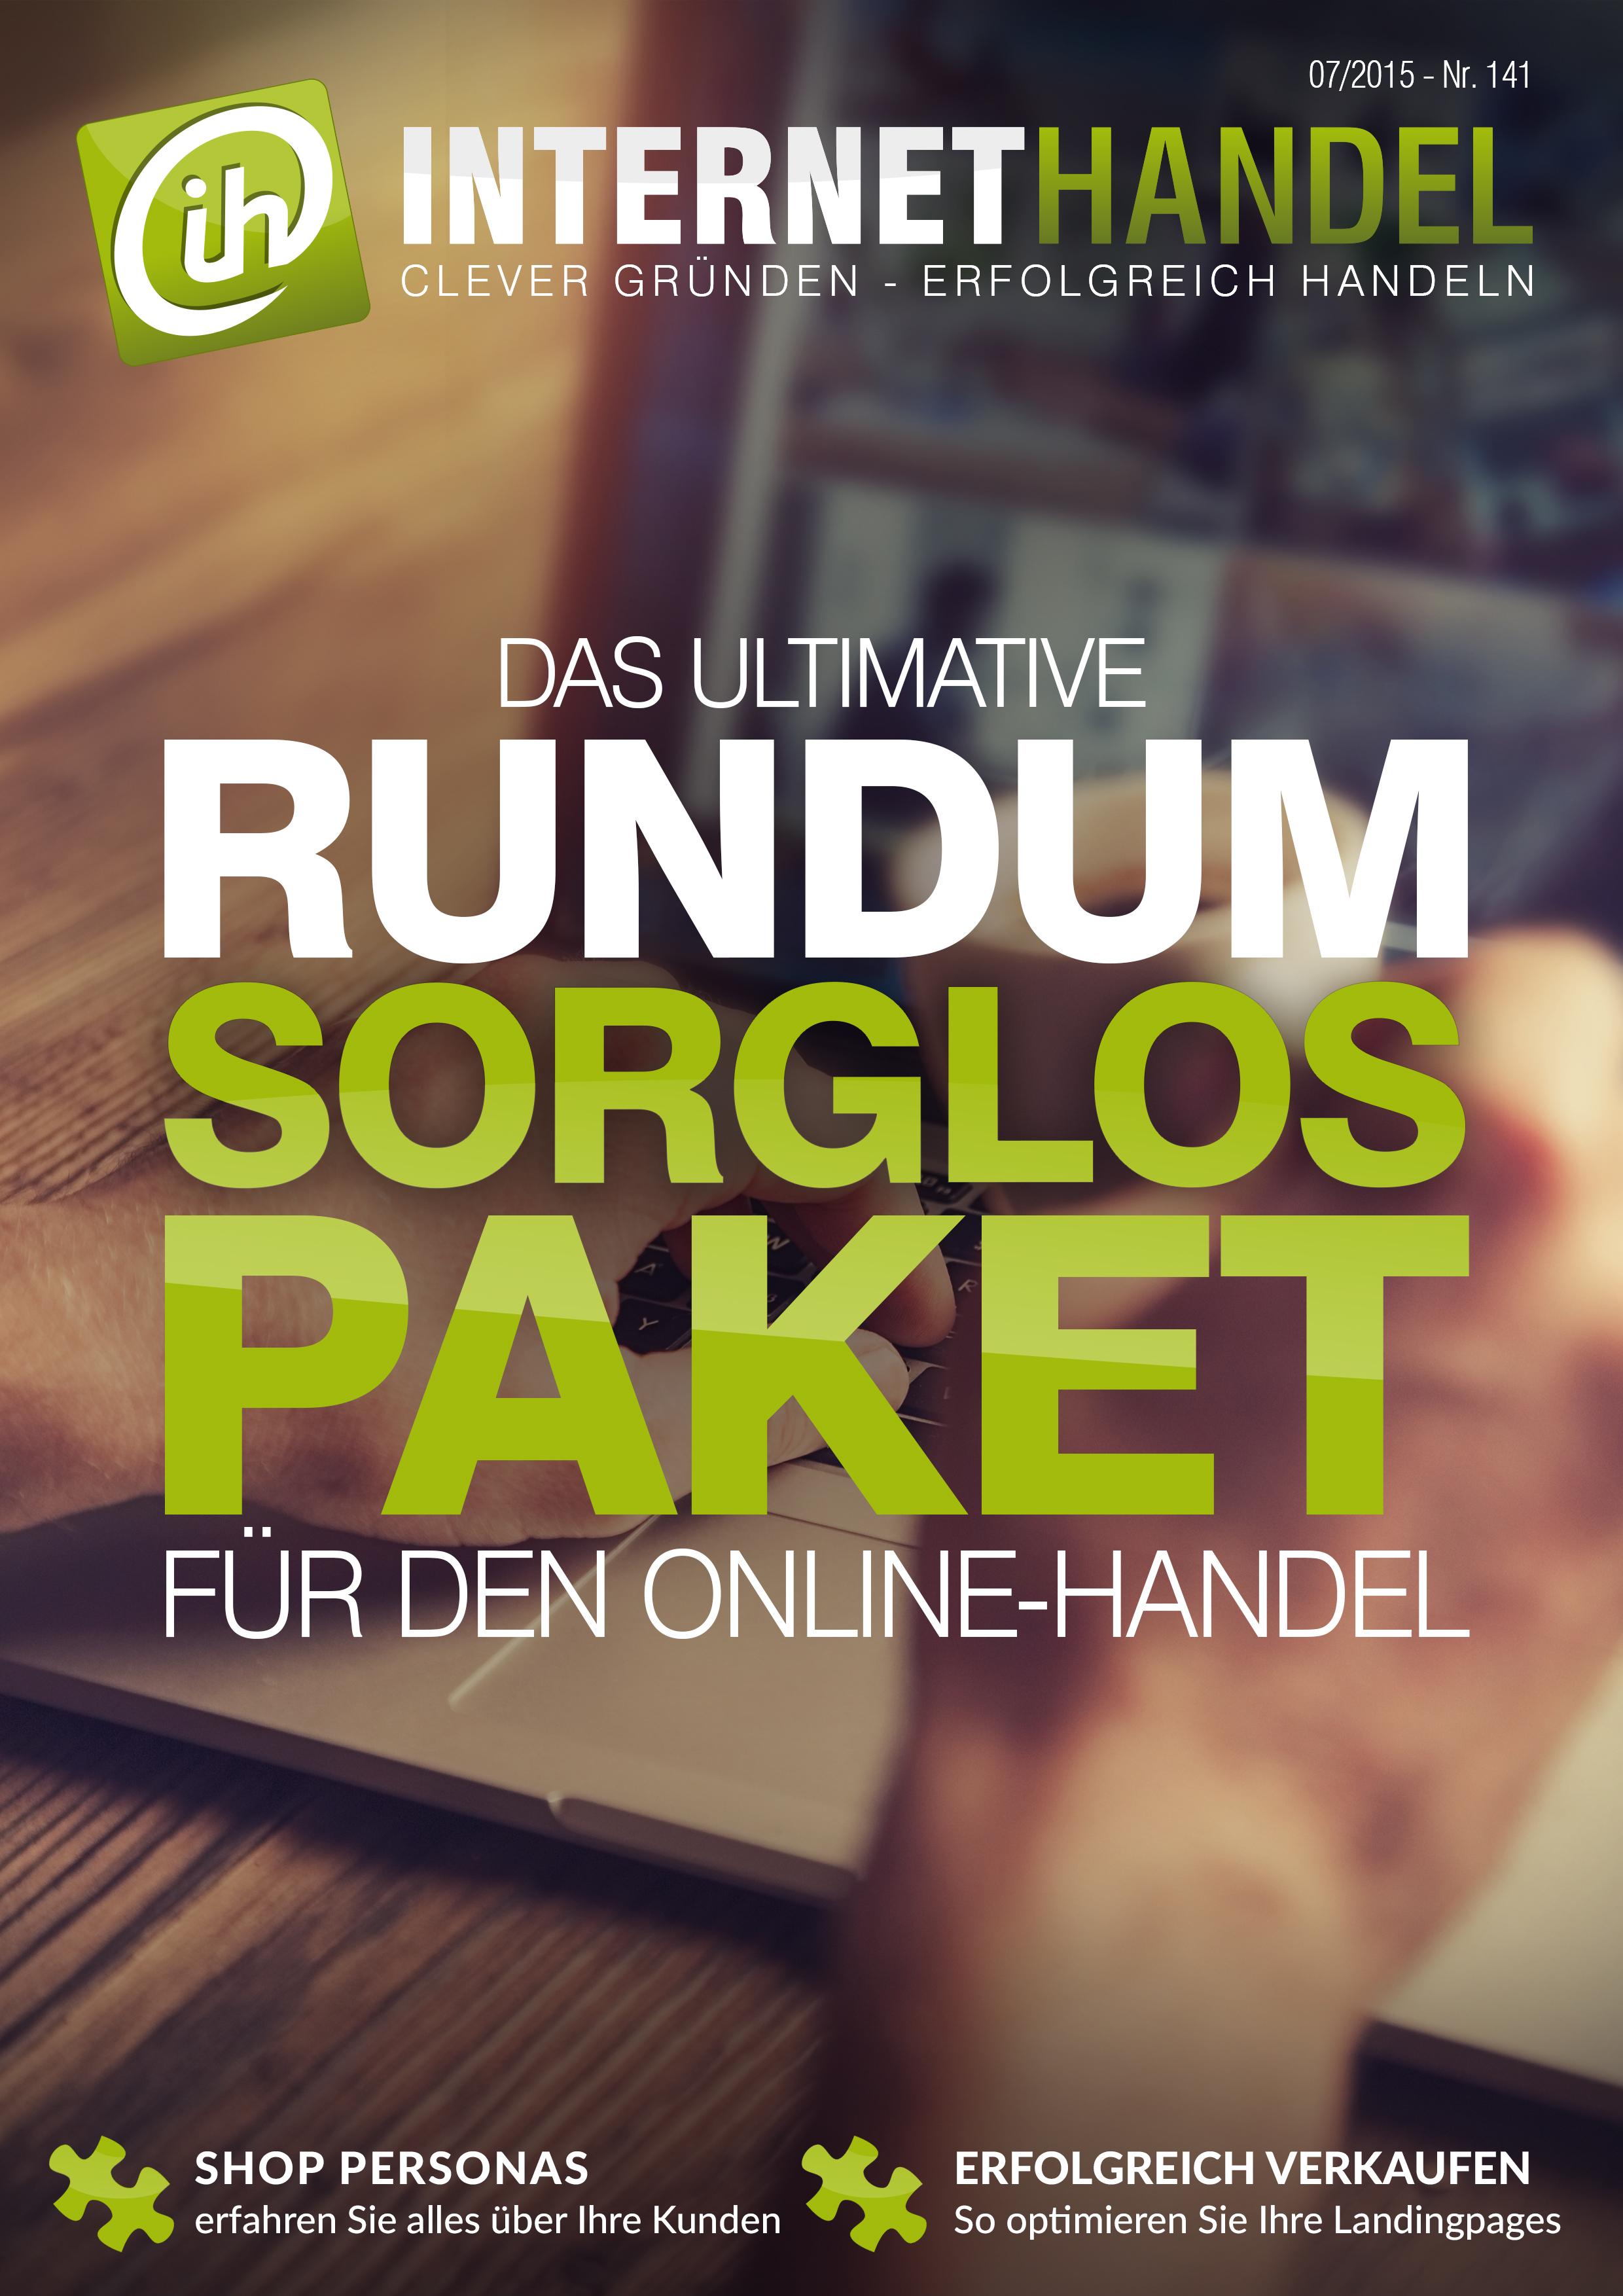 Titelbild-Internethandel-de-Nr-141-07-2015-Das-ultimative-Rundum-Sorglos-Paket-fuer-den-Online-Handel